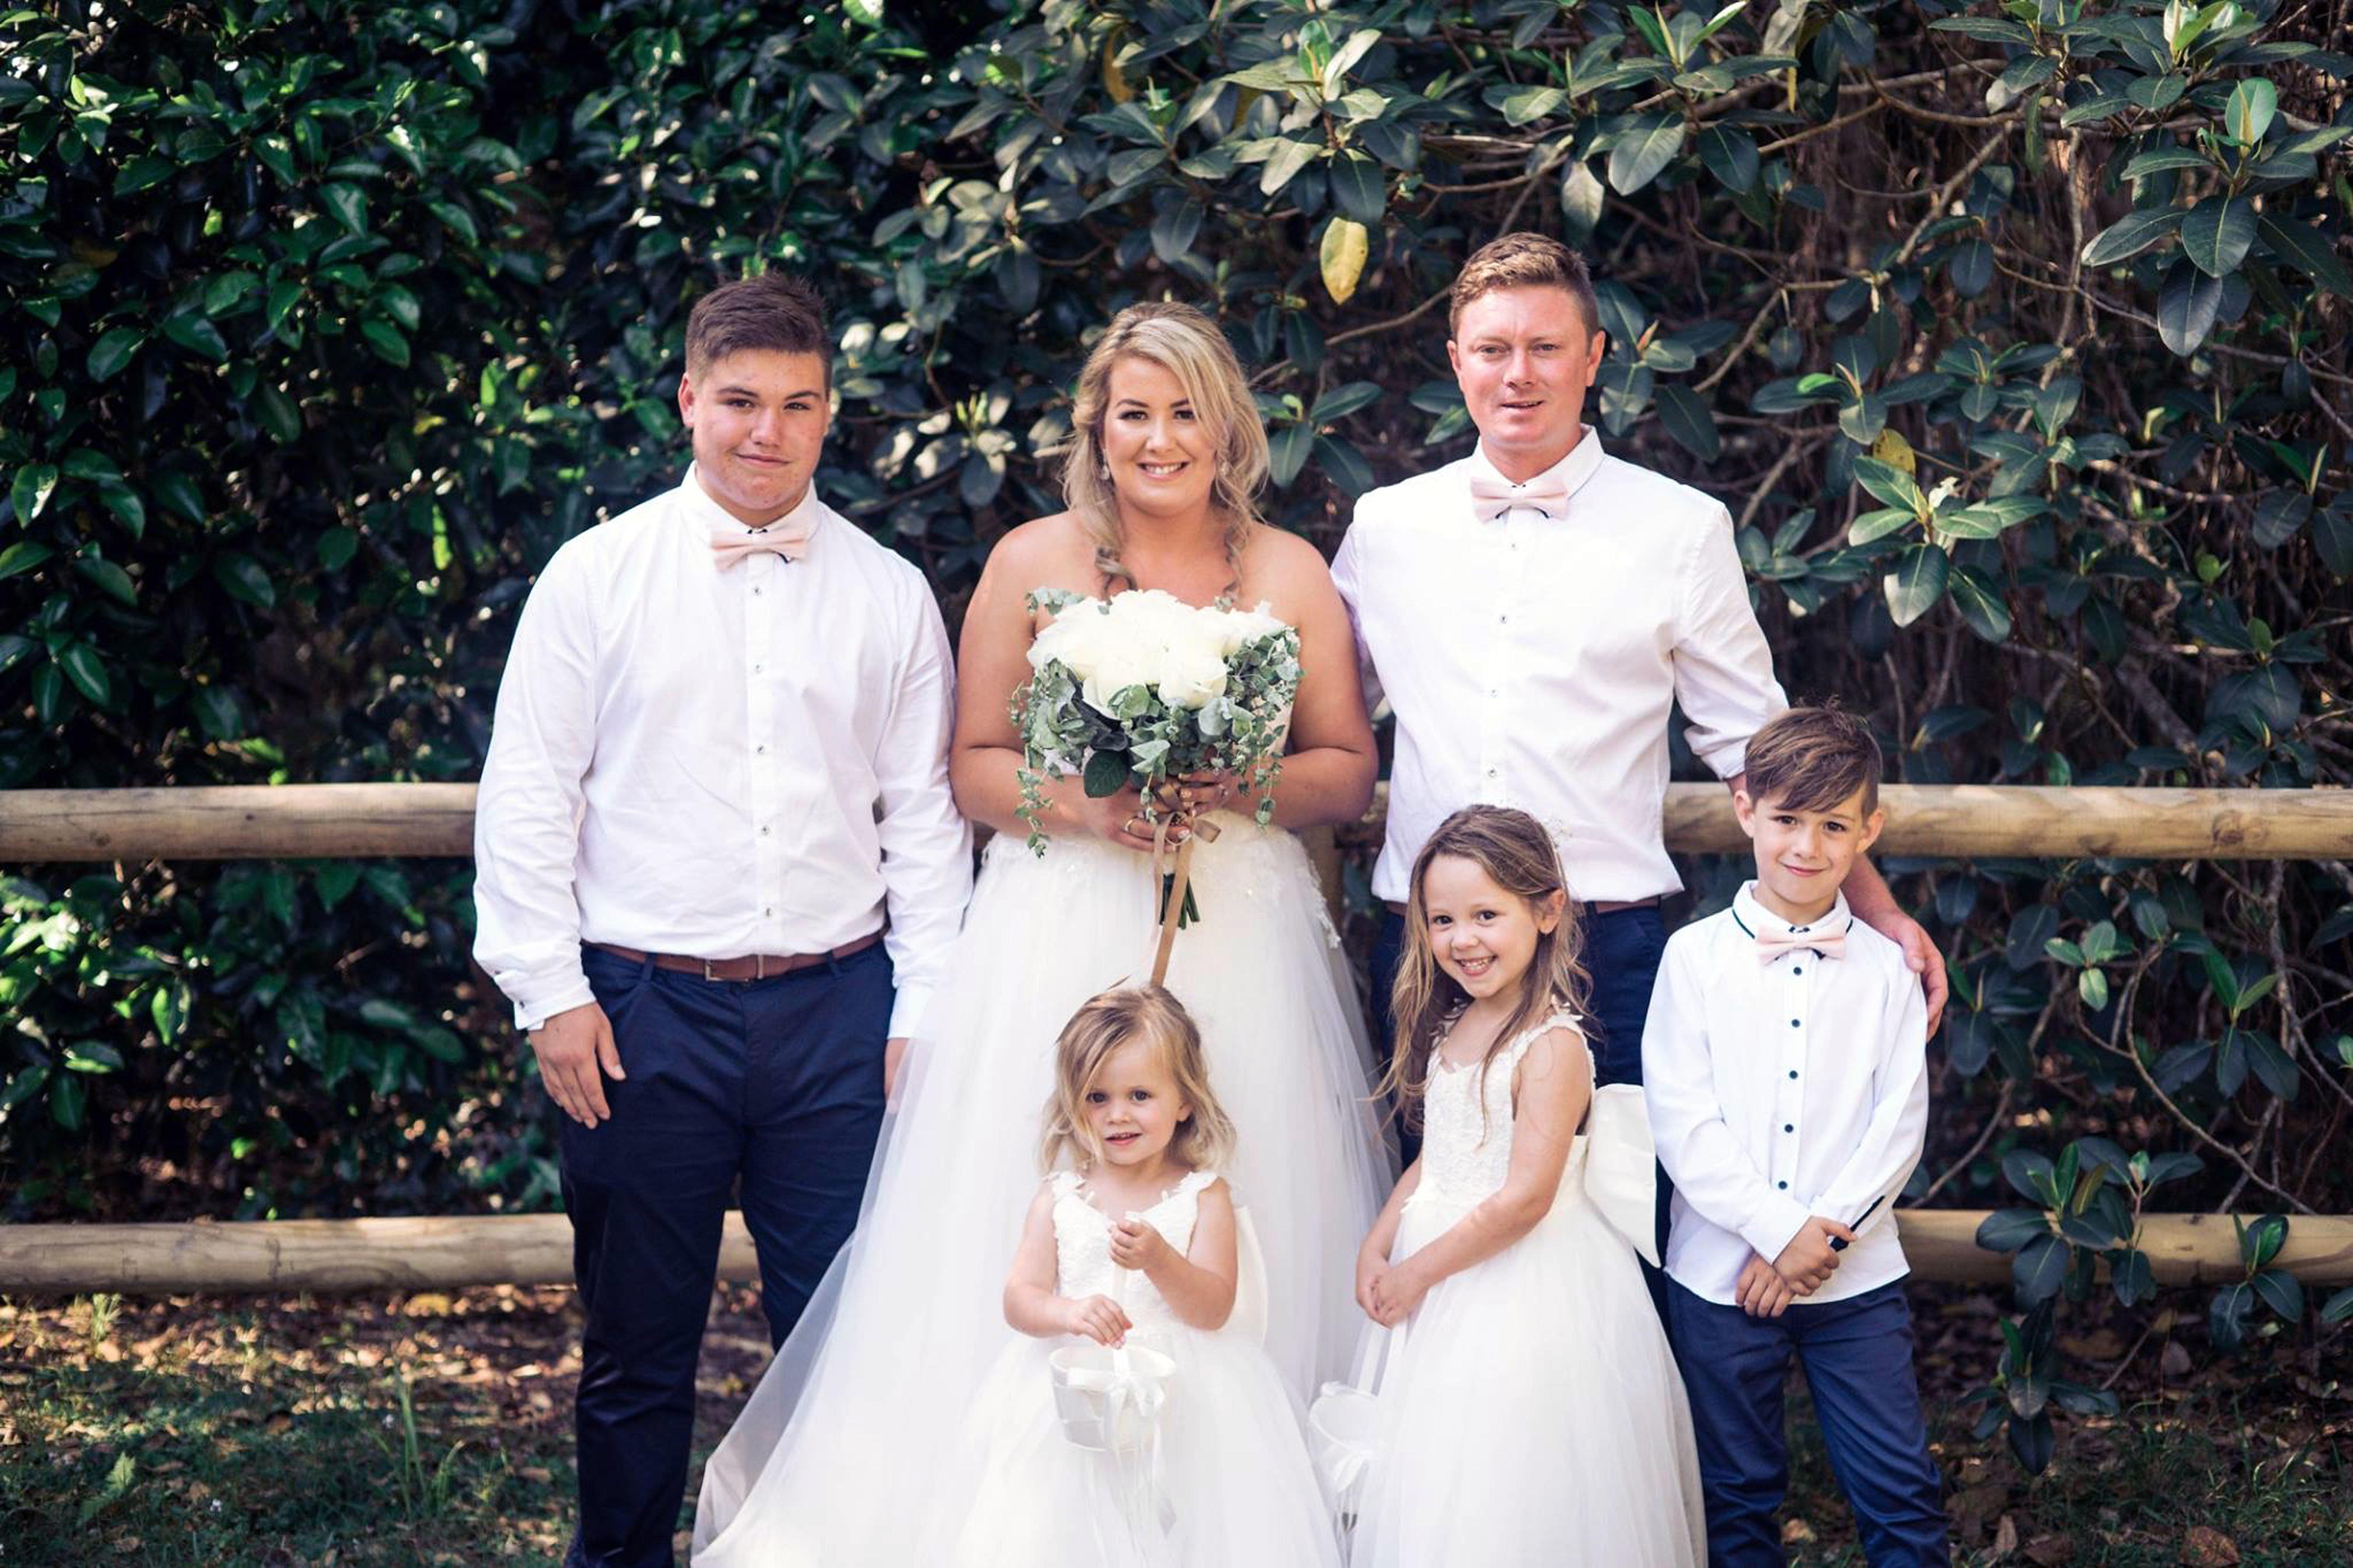 Cheeky 3-Year-Old Bridesmaid Flips The Bird In Mum's Wedding